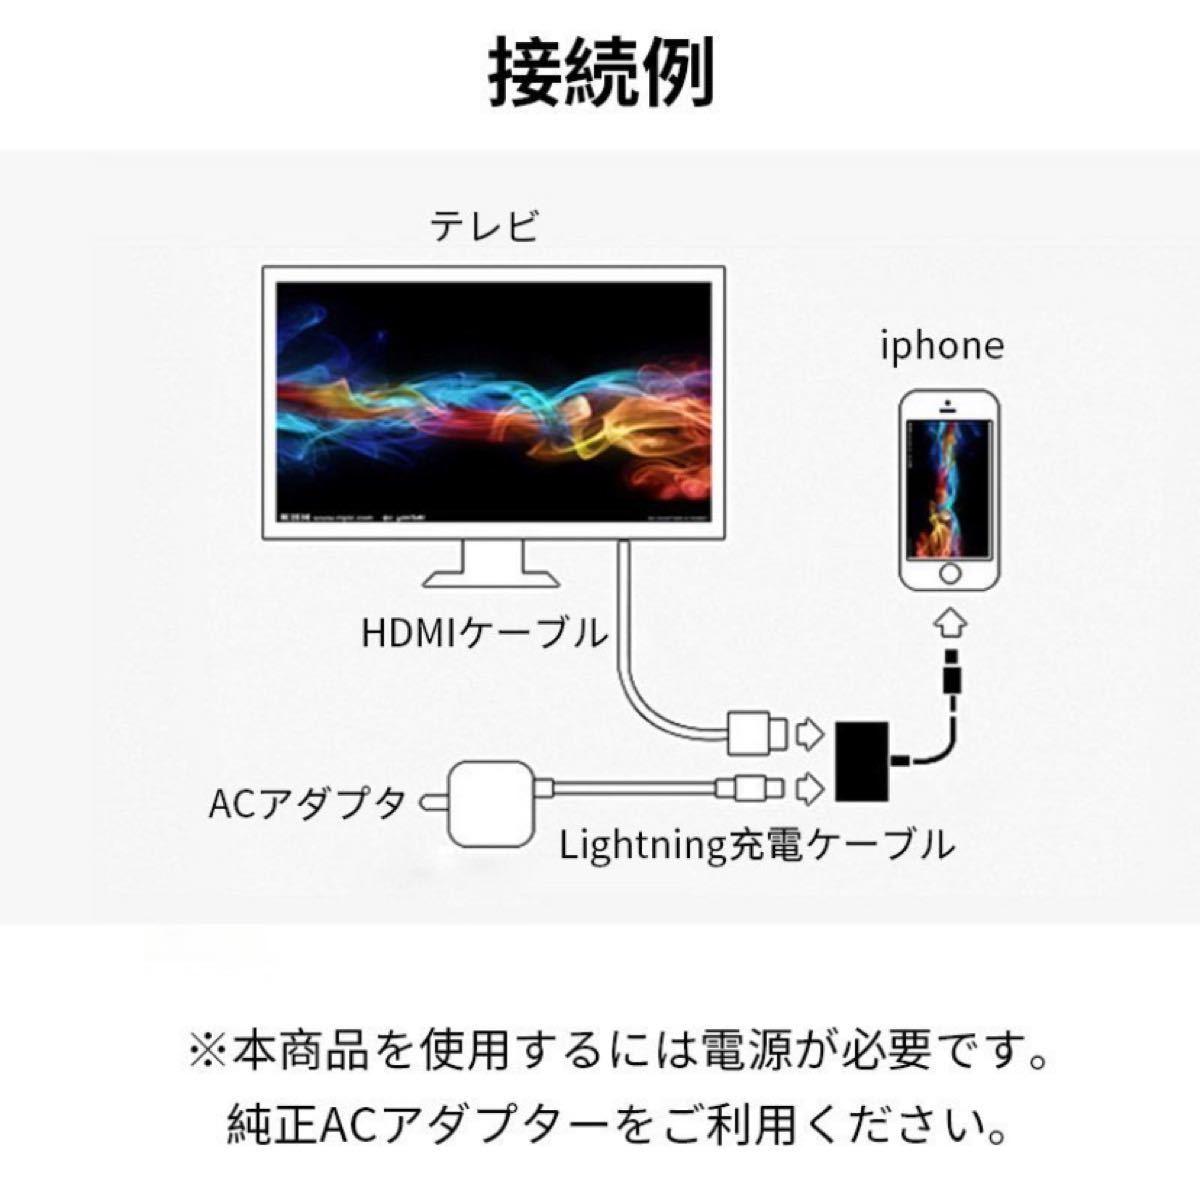 iPhone iPad HDMI変換 アップル AVアダプタ Lightning Digital HDMI変換ケーブル HD画質